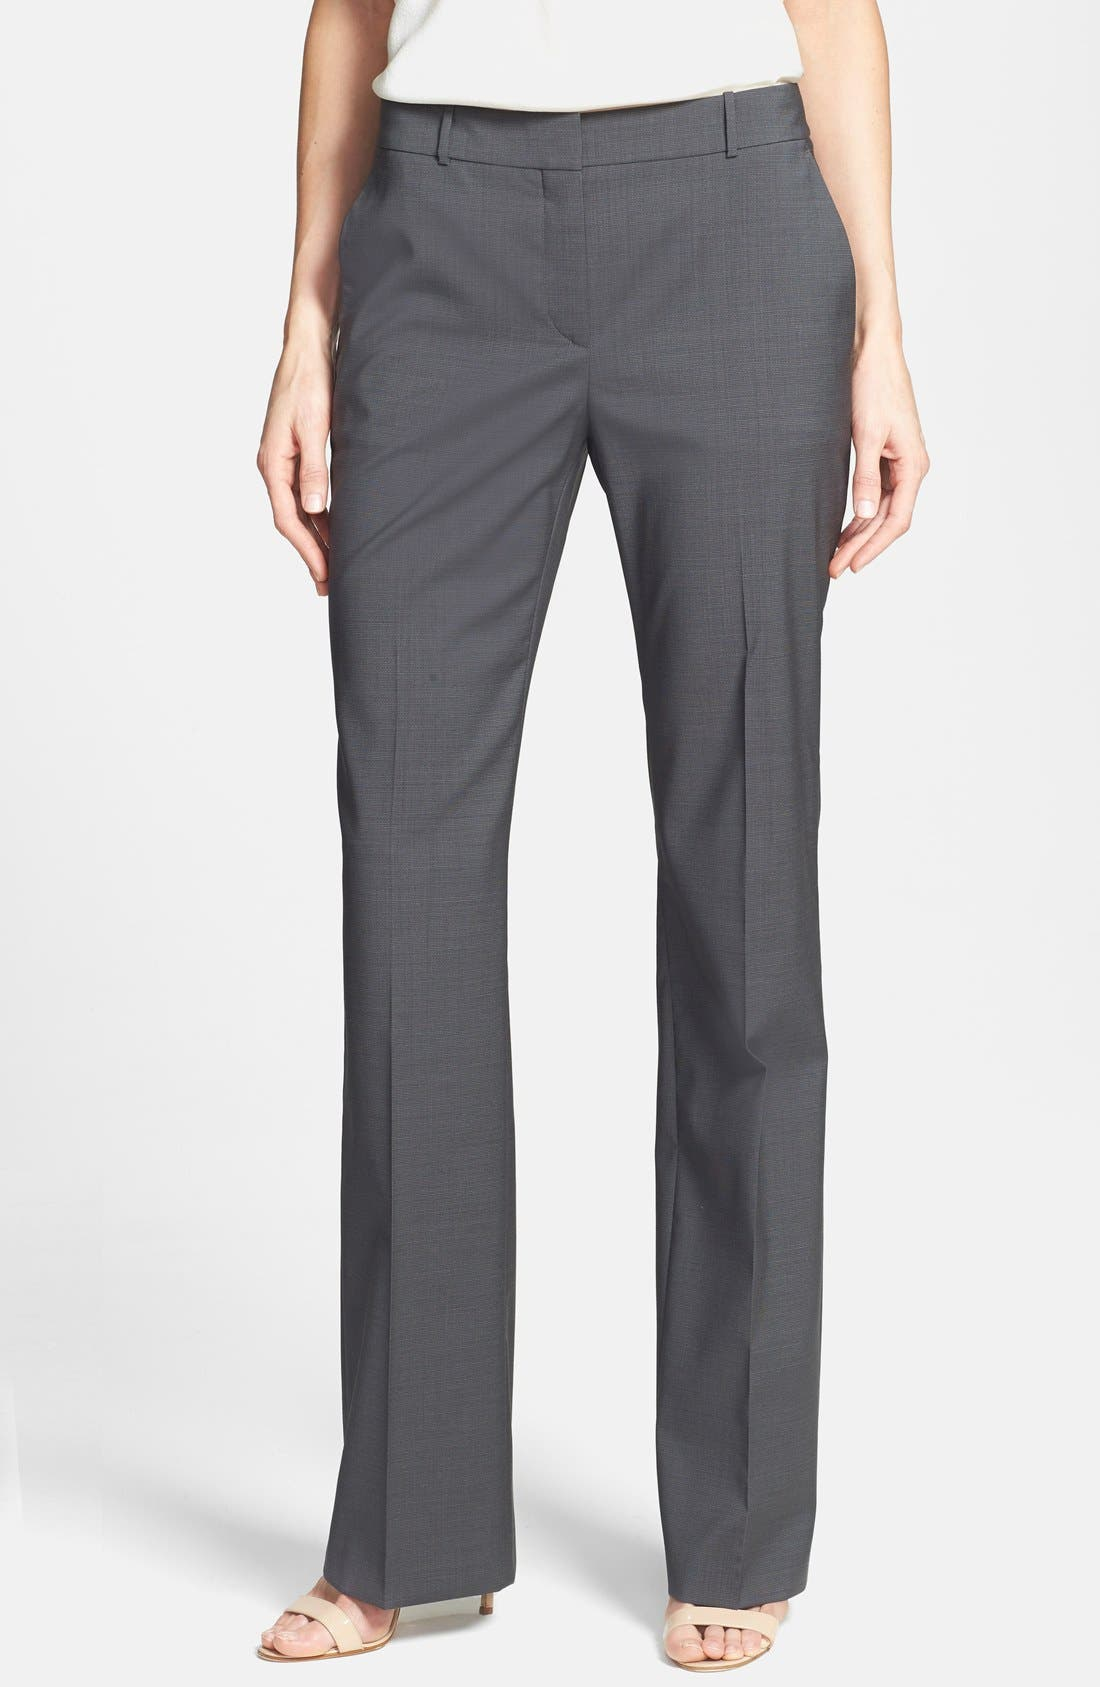 Alternate Image 1 Selected - BOSS HUGO BOSS 'Taliani' Stretch Wool Blend Pants